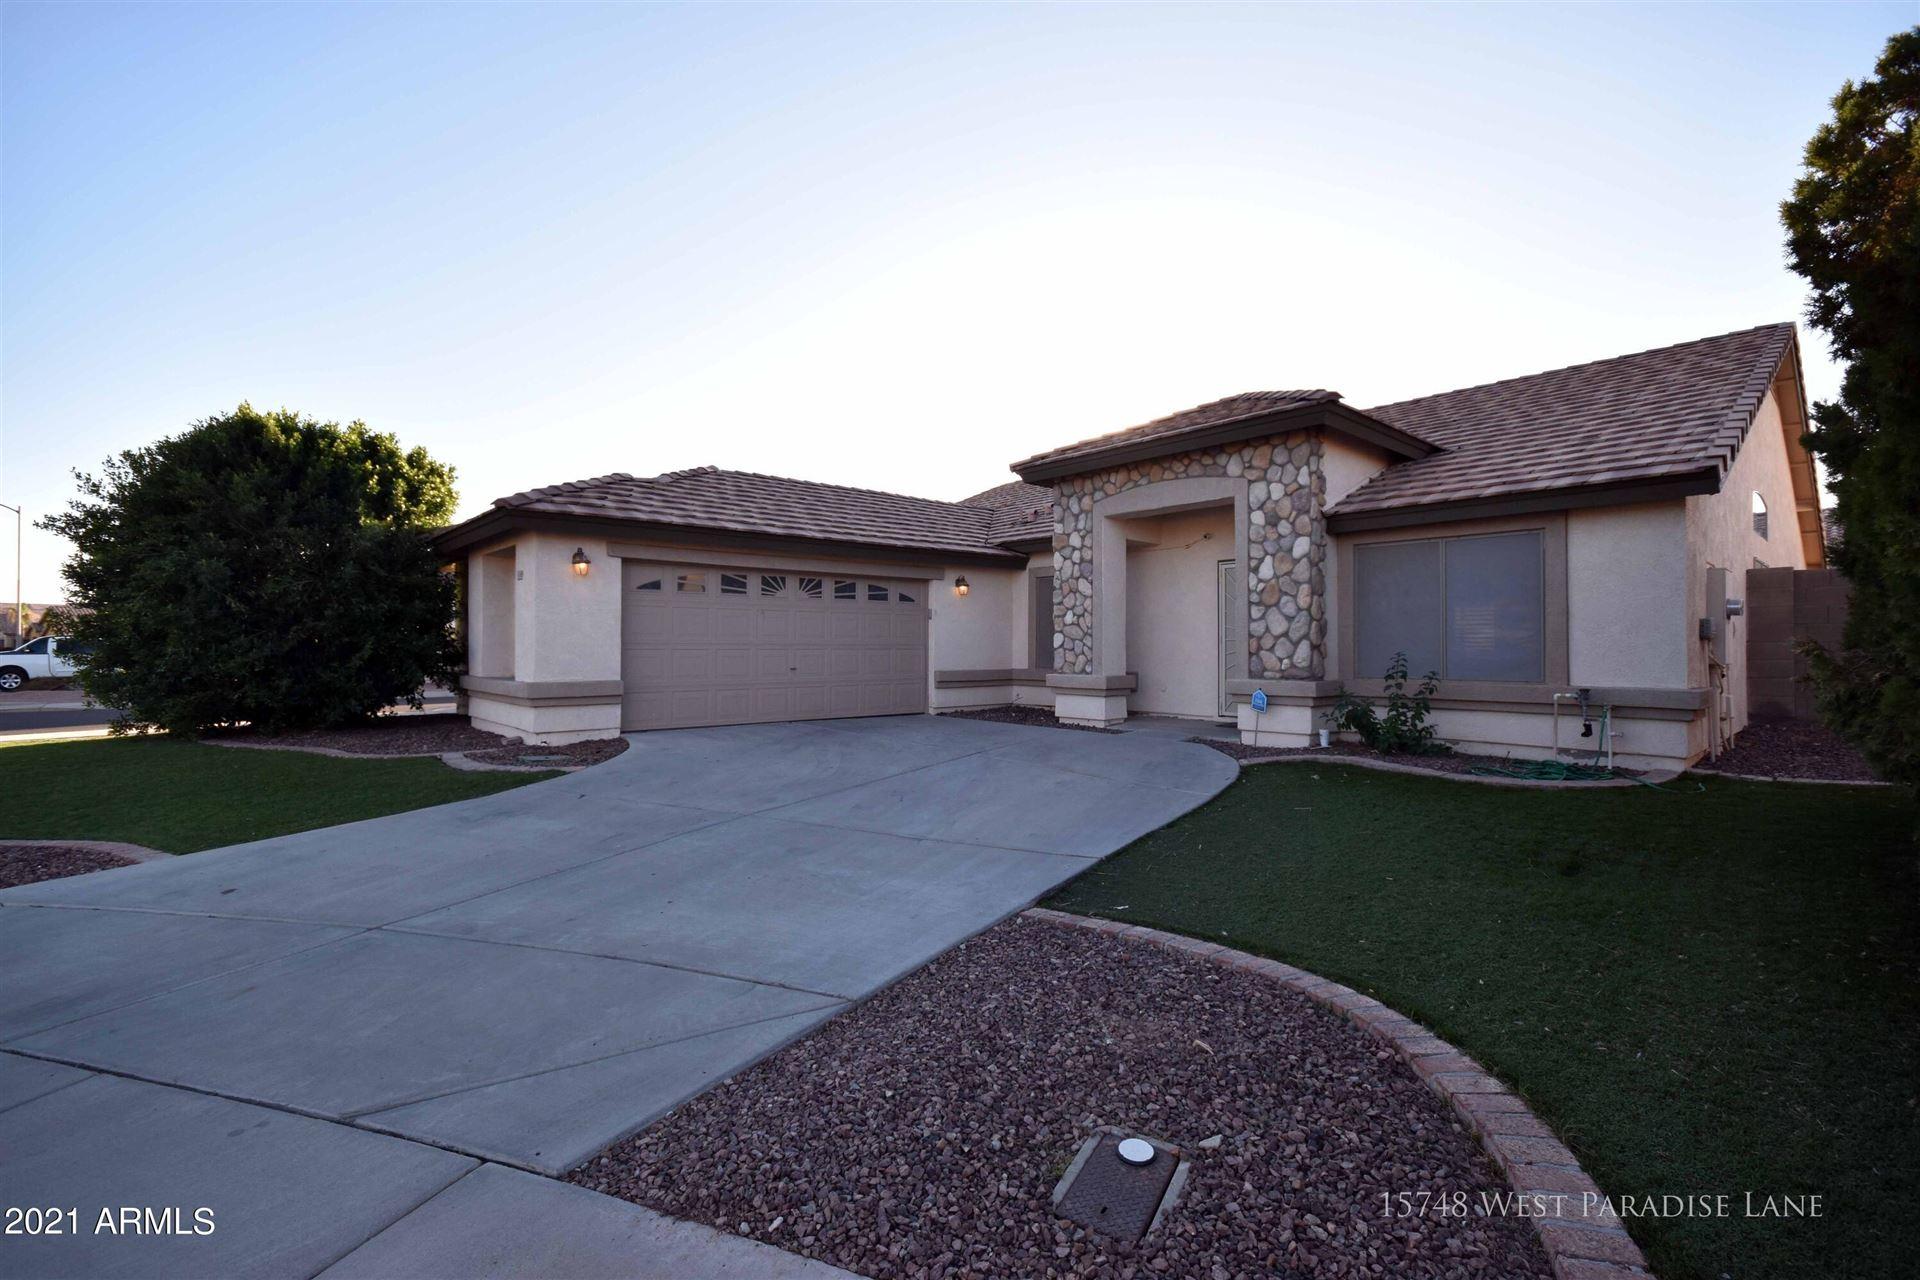 Photo of 15748 W PARADISE Lane, Surprise, AZ 85374 (MLS # 6295944)